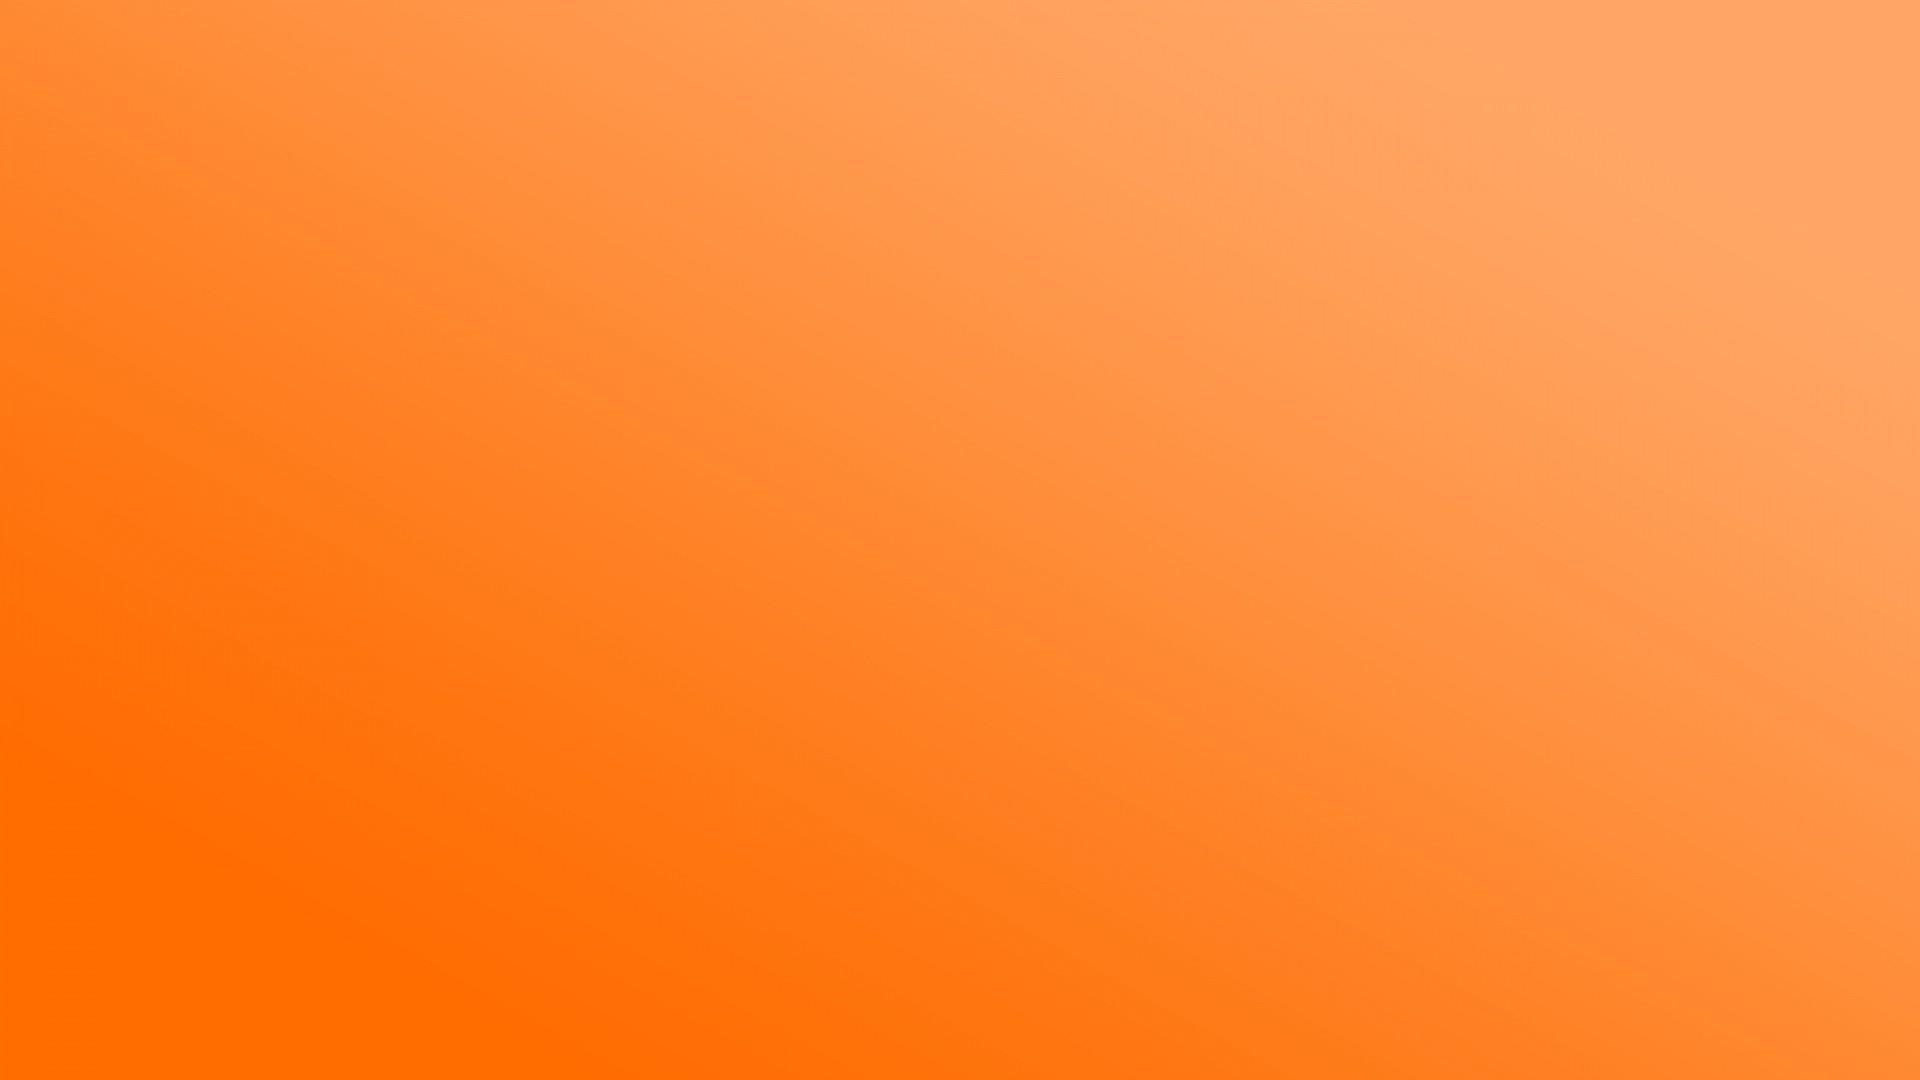 Preview wallpaper orange, white, solid, colorful 1920×1080